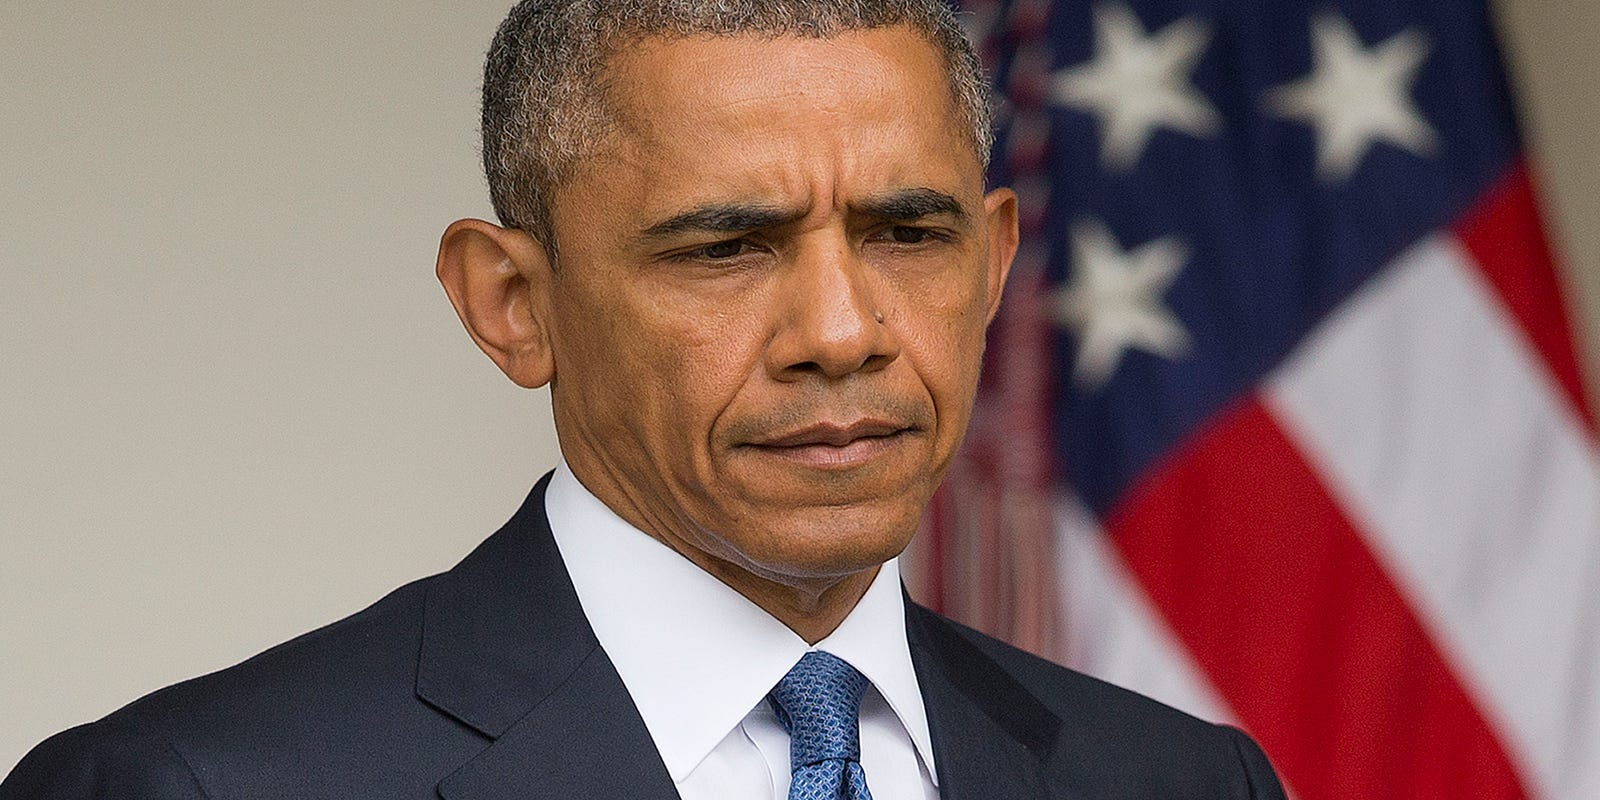 Obama legacy includes banker impunity